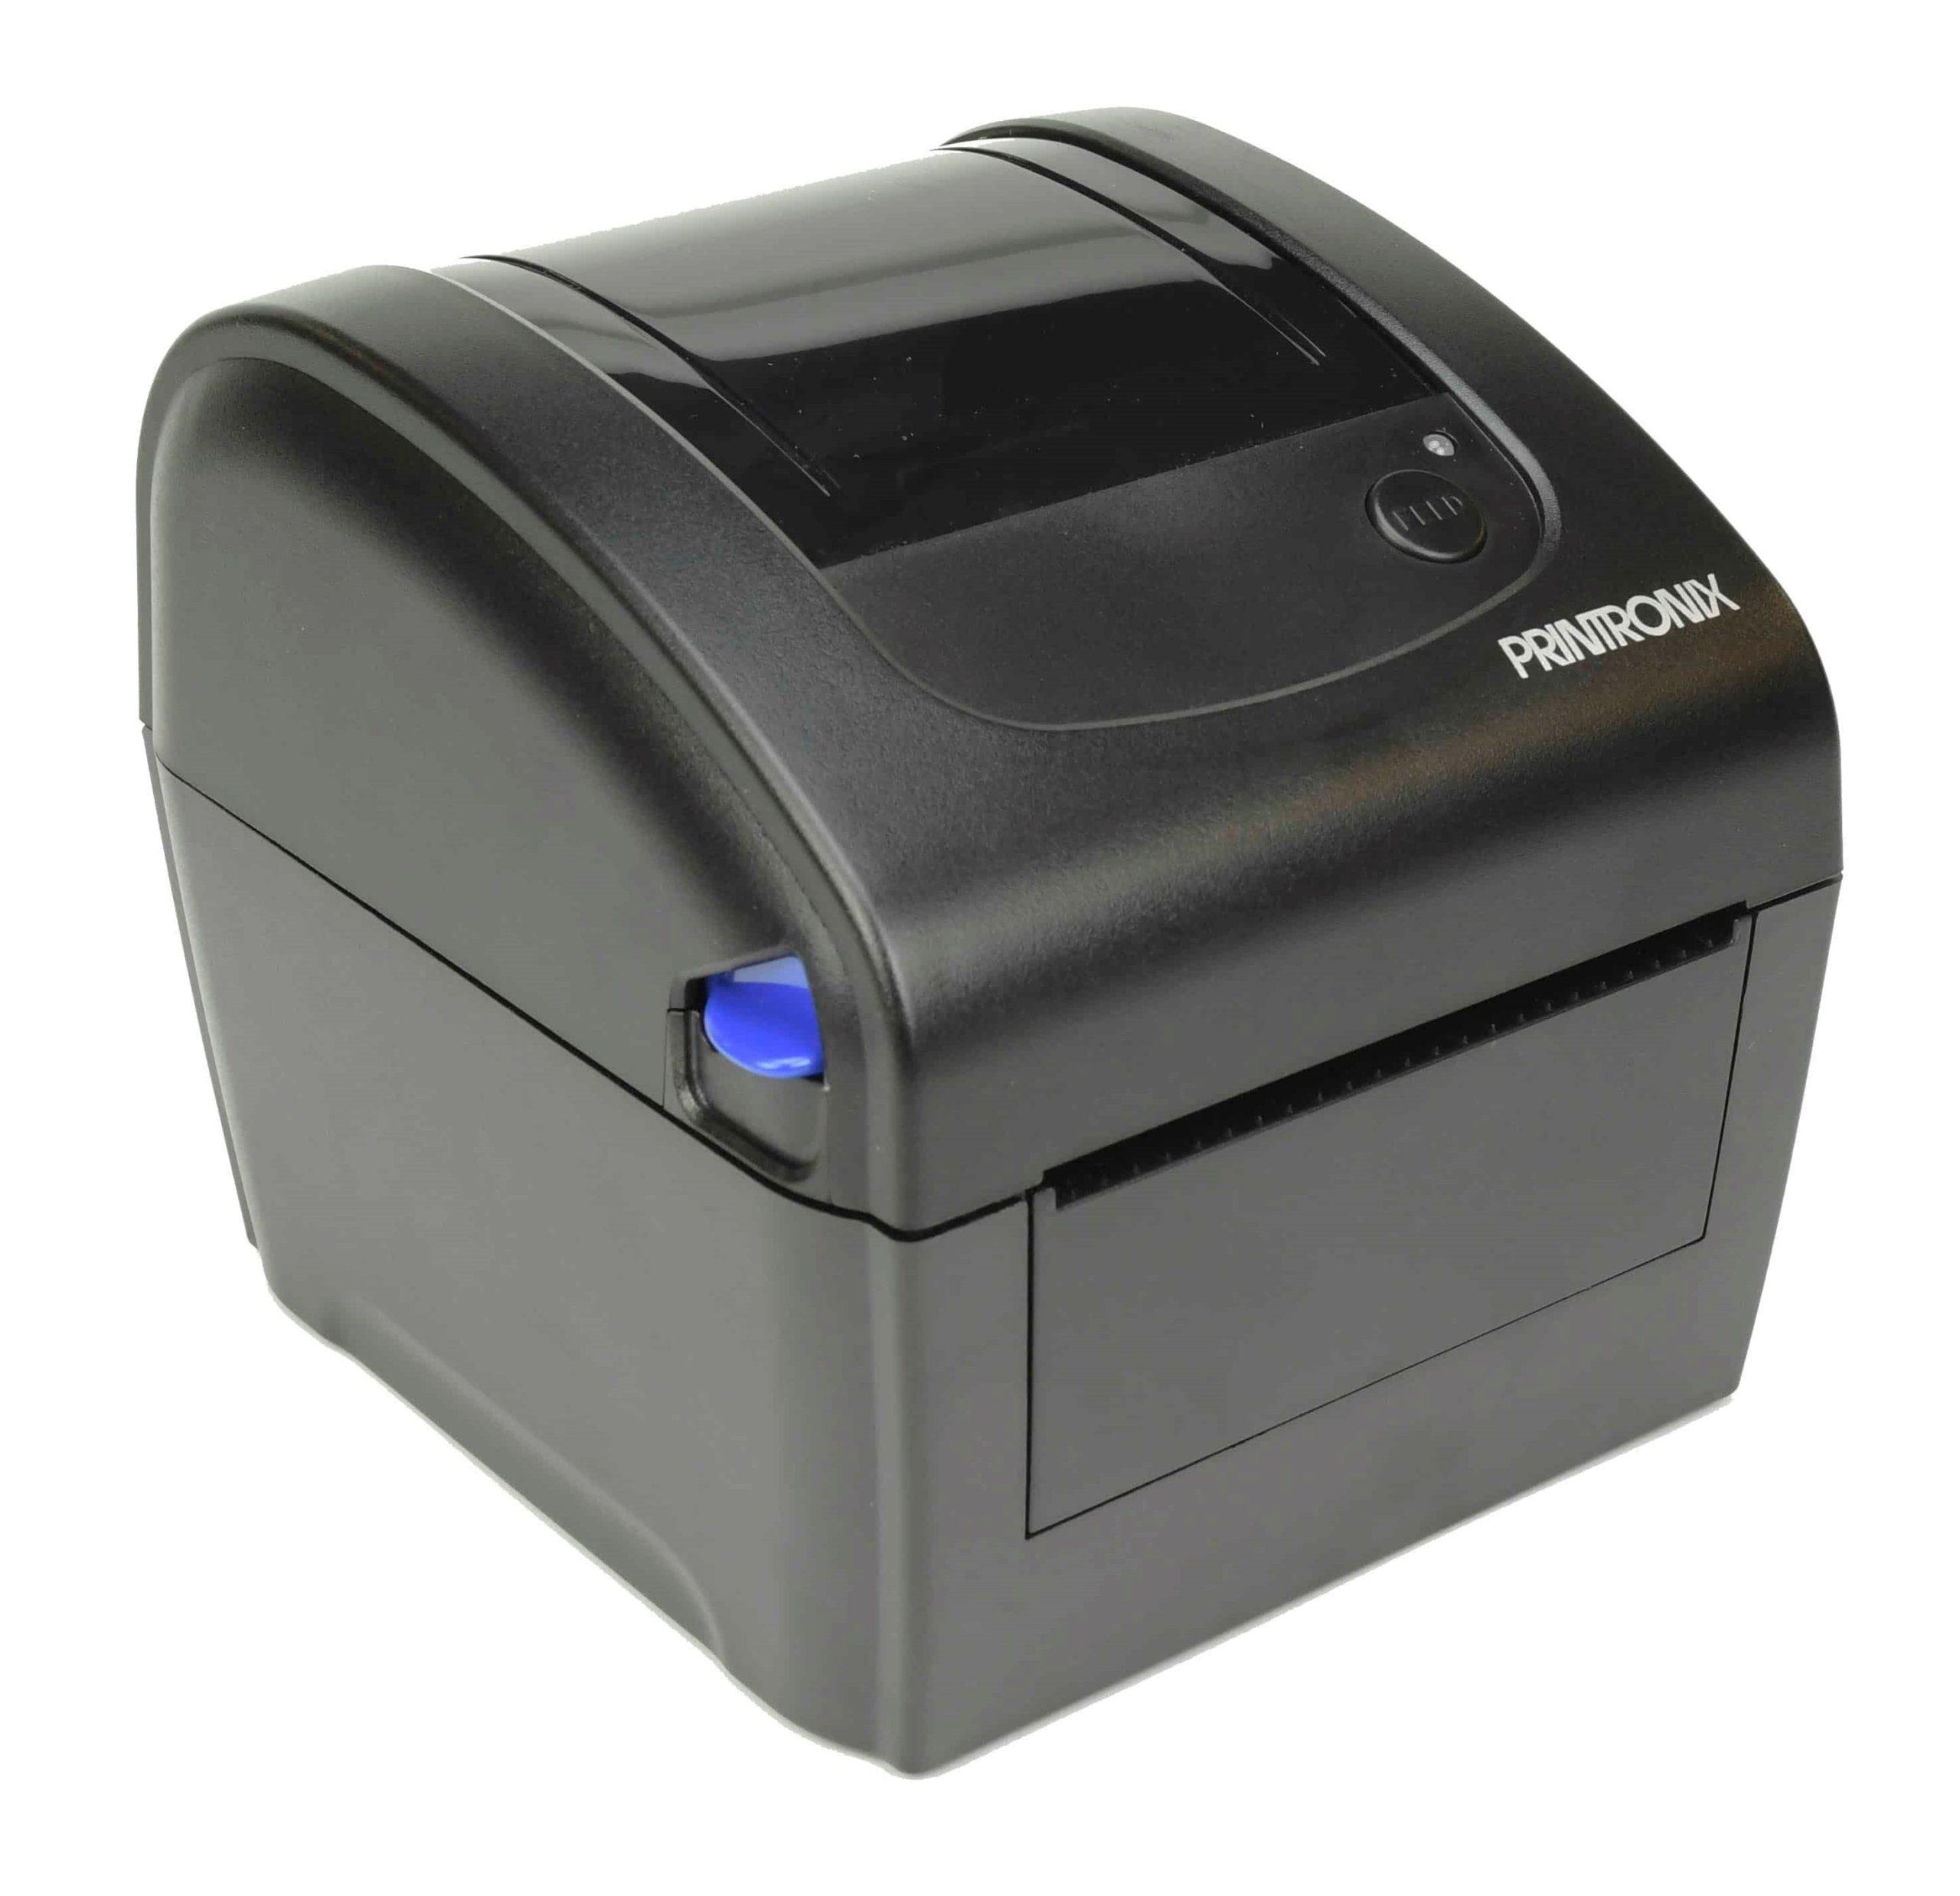 T400 Printronix Auto ID Desktop Printers